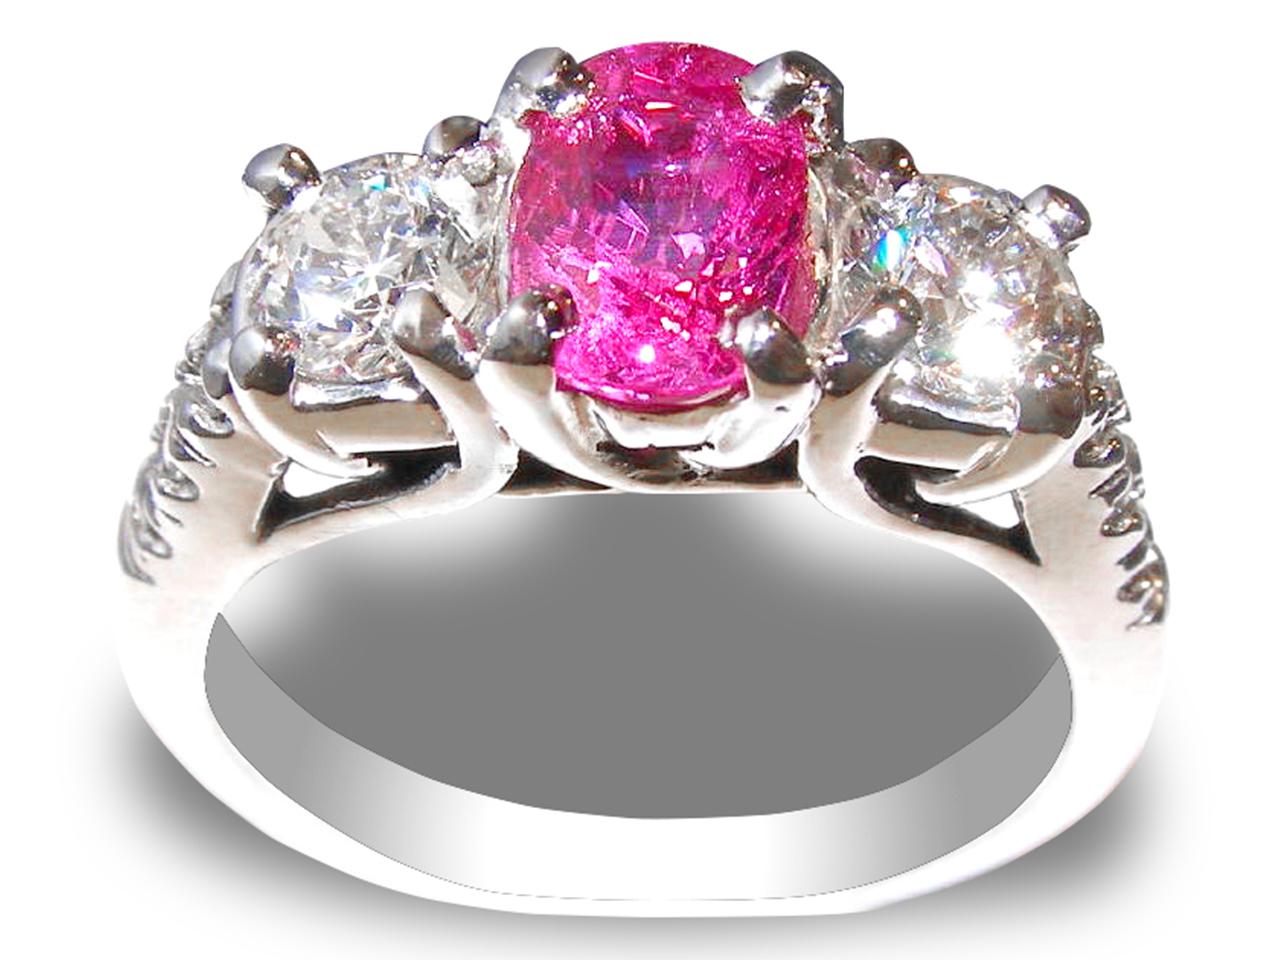 GIT Certified Unheated Winza Ruby Diamond Ring 14KWG 2.61 ctw